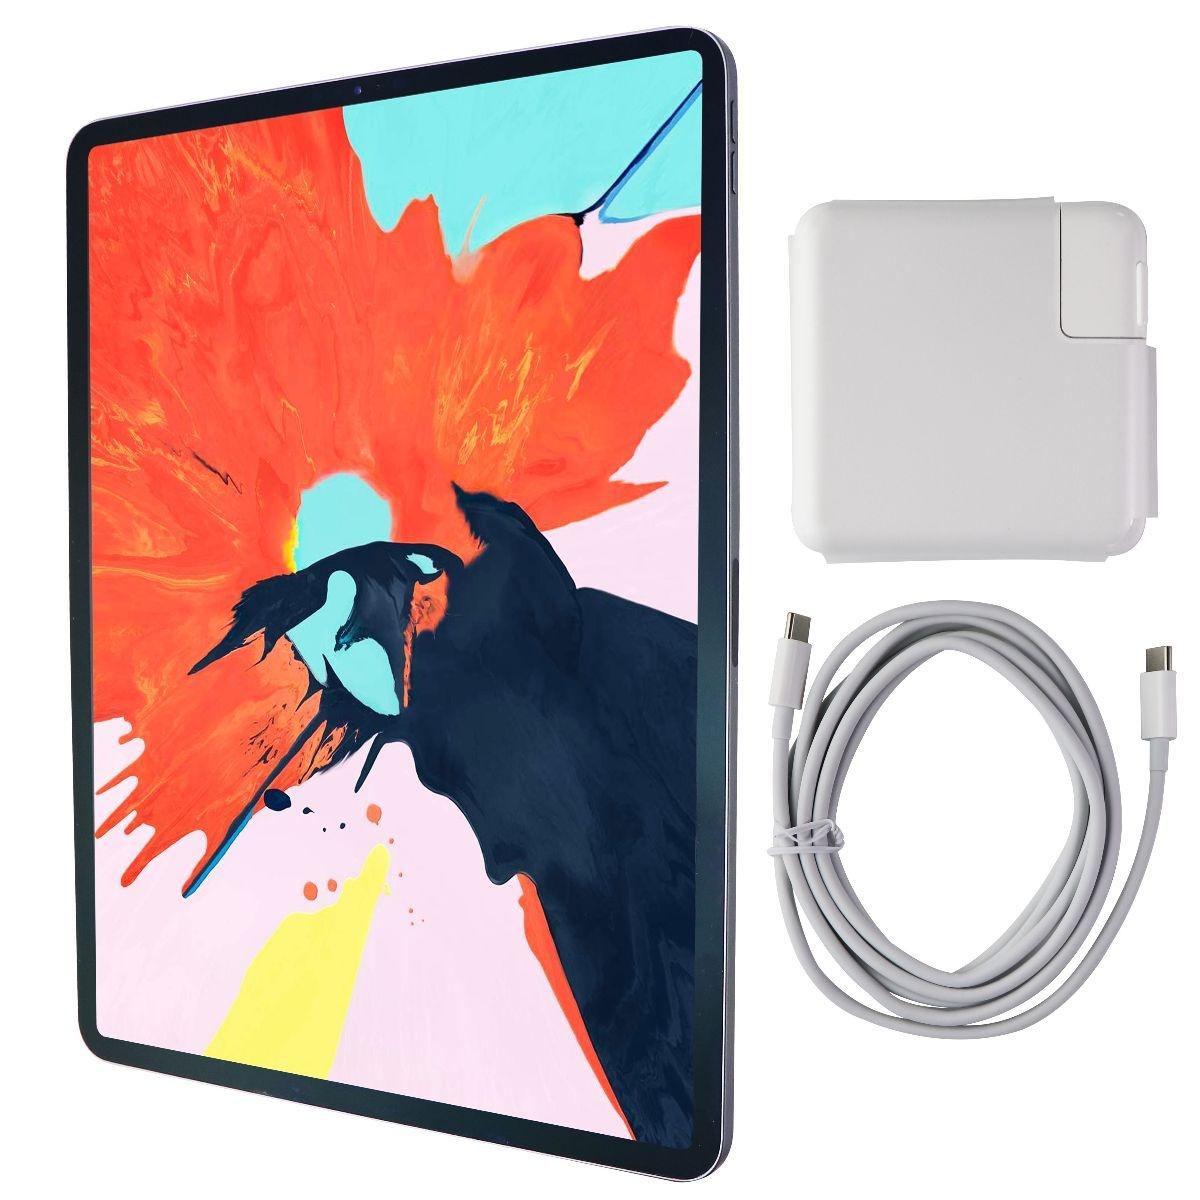 Apple iPad Pro 12.9-inch (3rd Gen) Tablet A1876 - 256GB ...